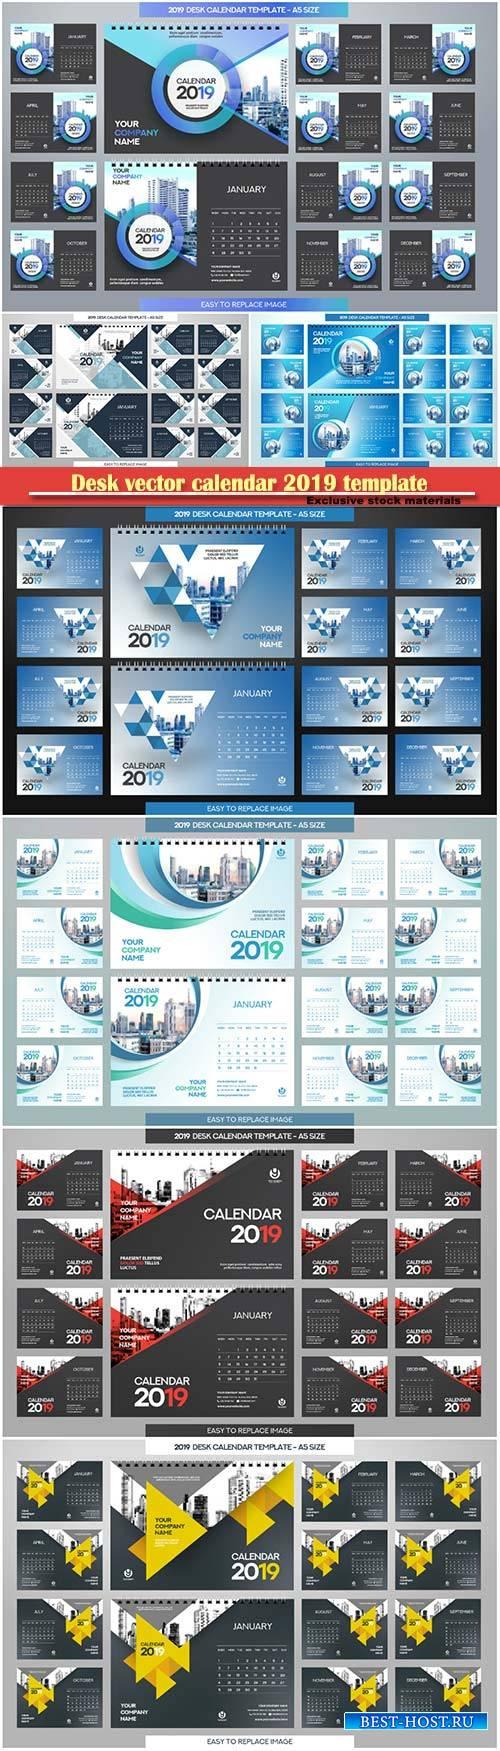 Desk vector calendar 2019 template, 12 months included